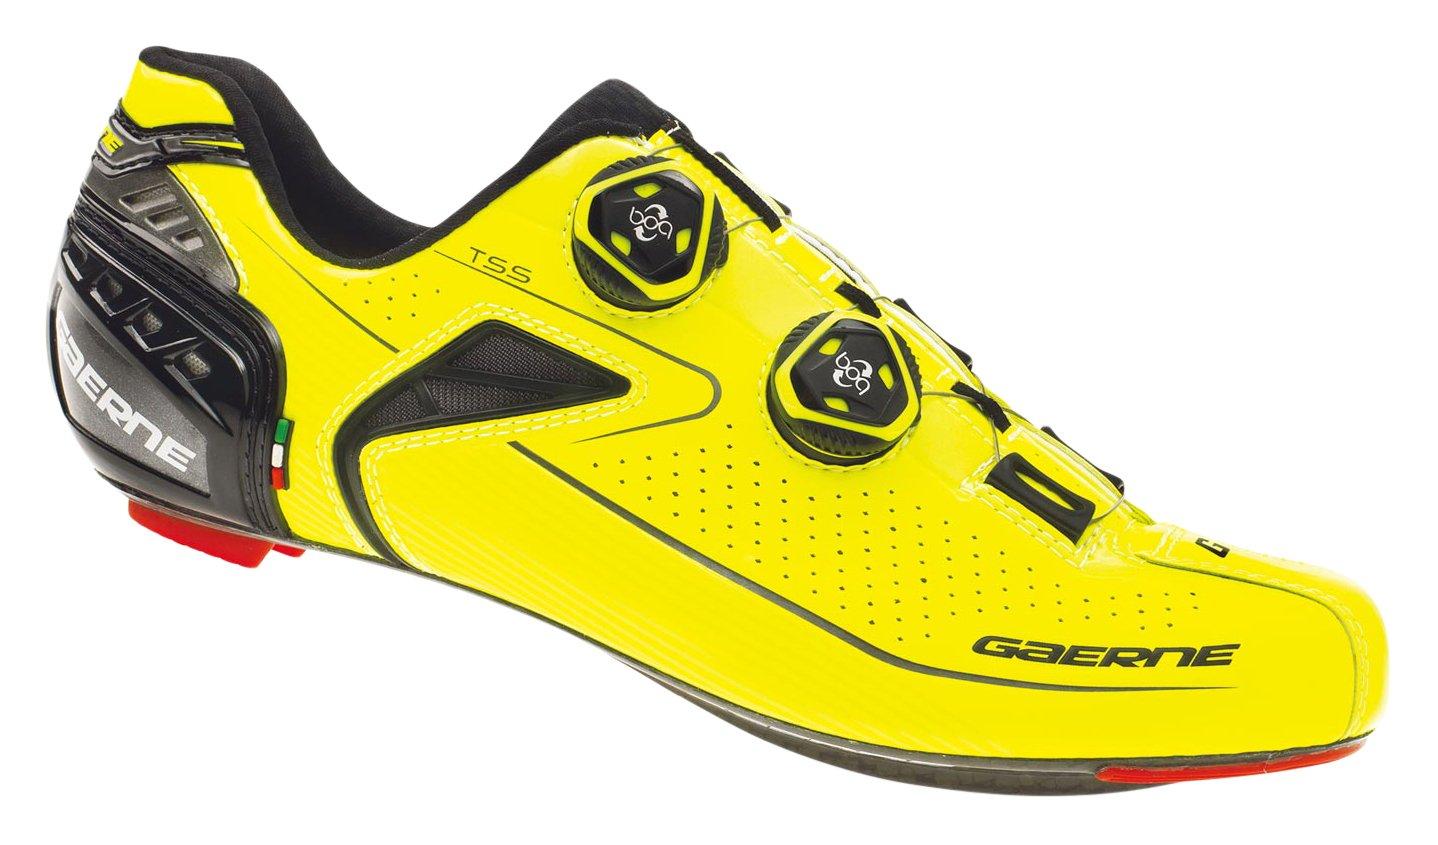 gaerne(ガエルネ) シューズ ビンディング 自転車 ロードバイク カーボン Gクロノ+ イエロー 26.5 3603-009-265 B077Y9YZKY